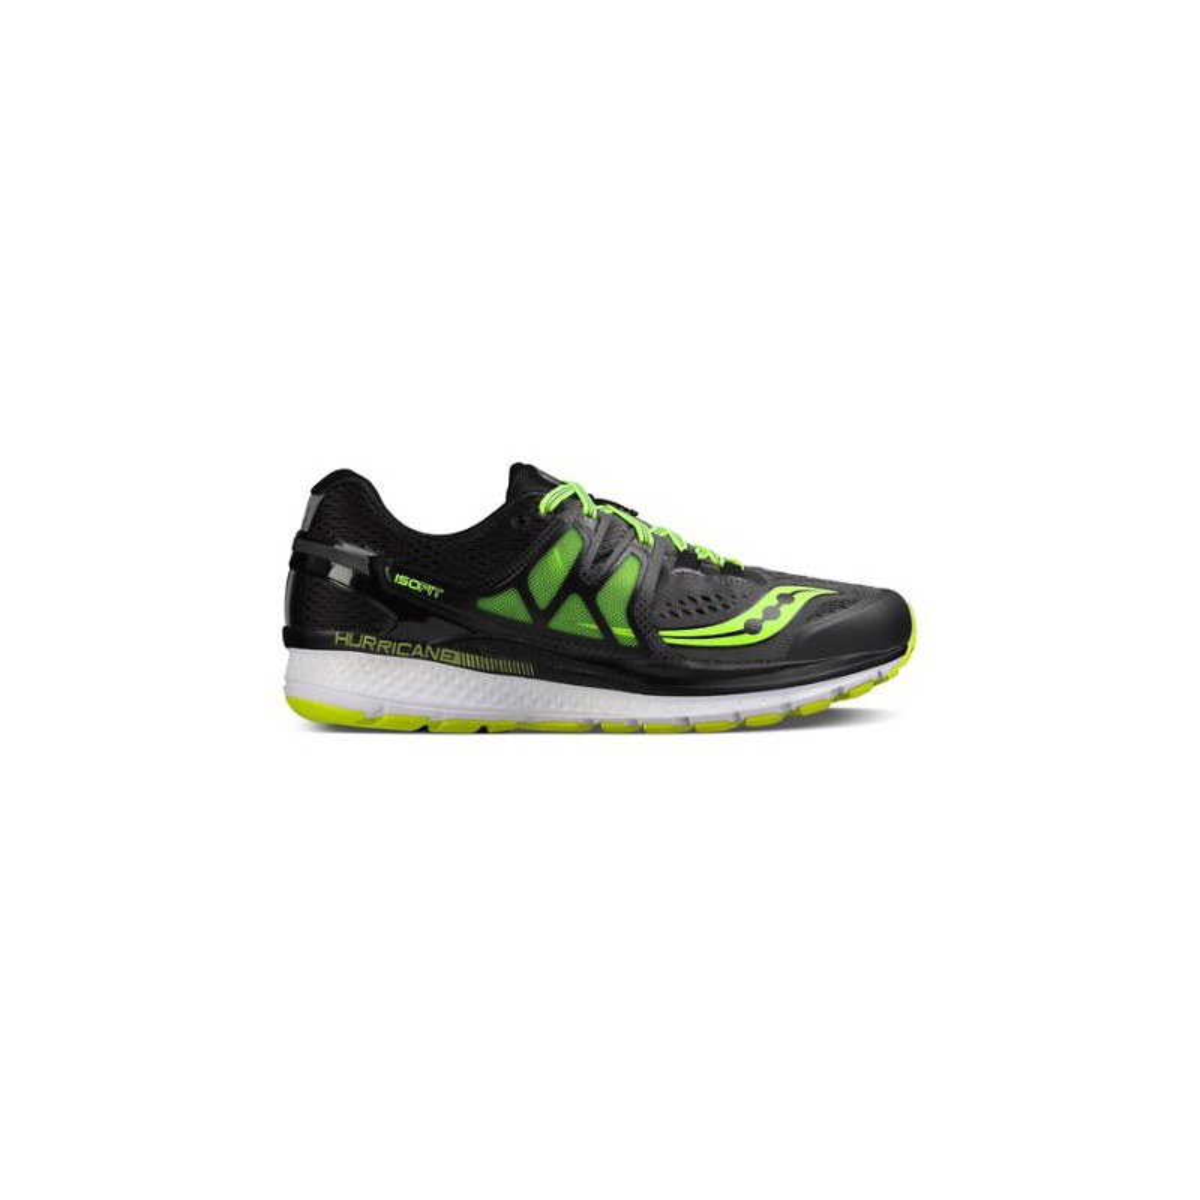 Running Shoes – Mens Saucony Hurricane Iso 3 BlackGreen Mens, Running Shoes, Shoes